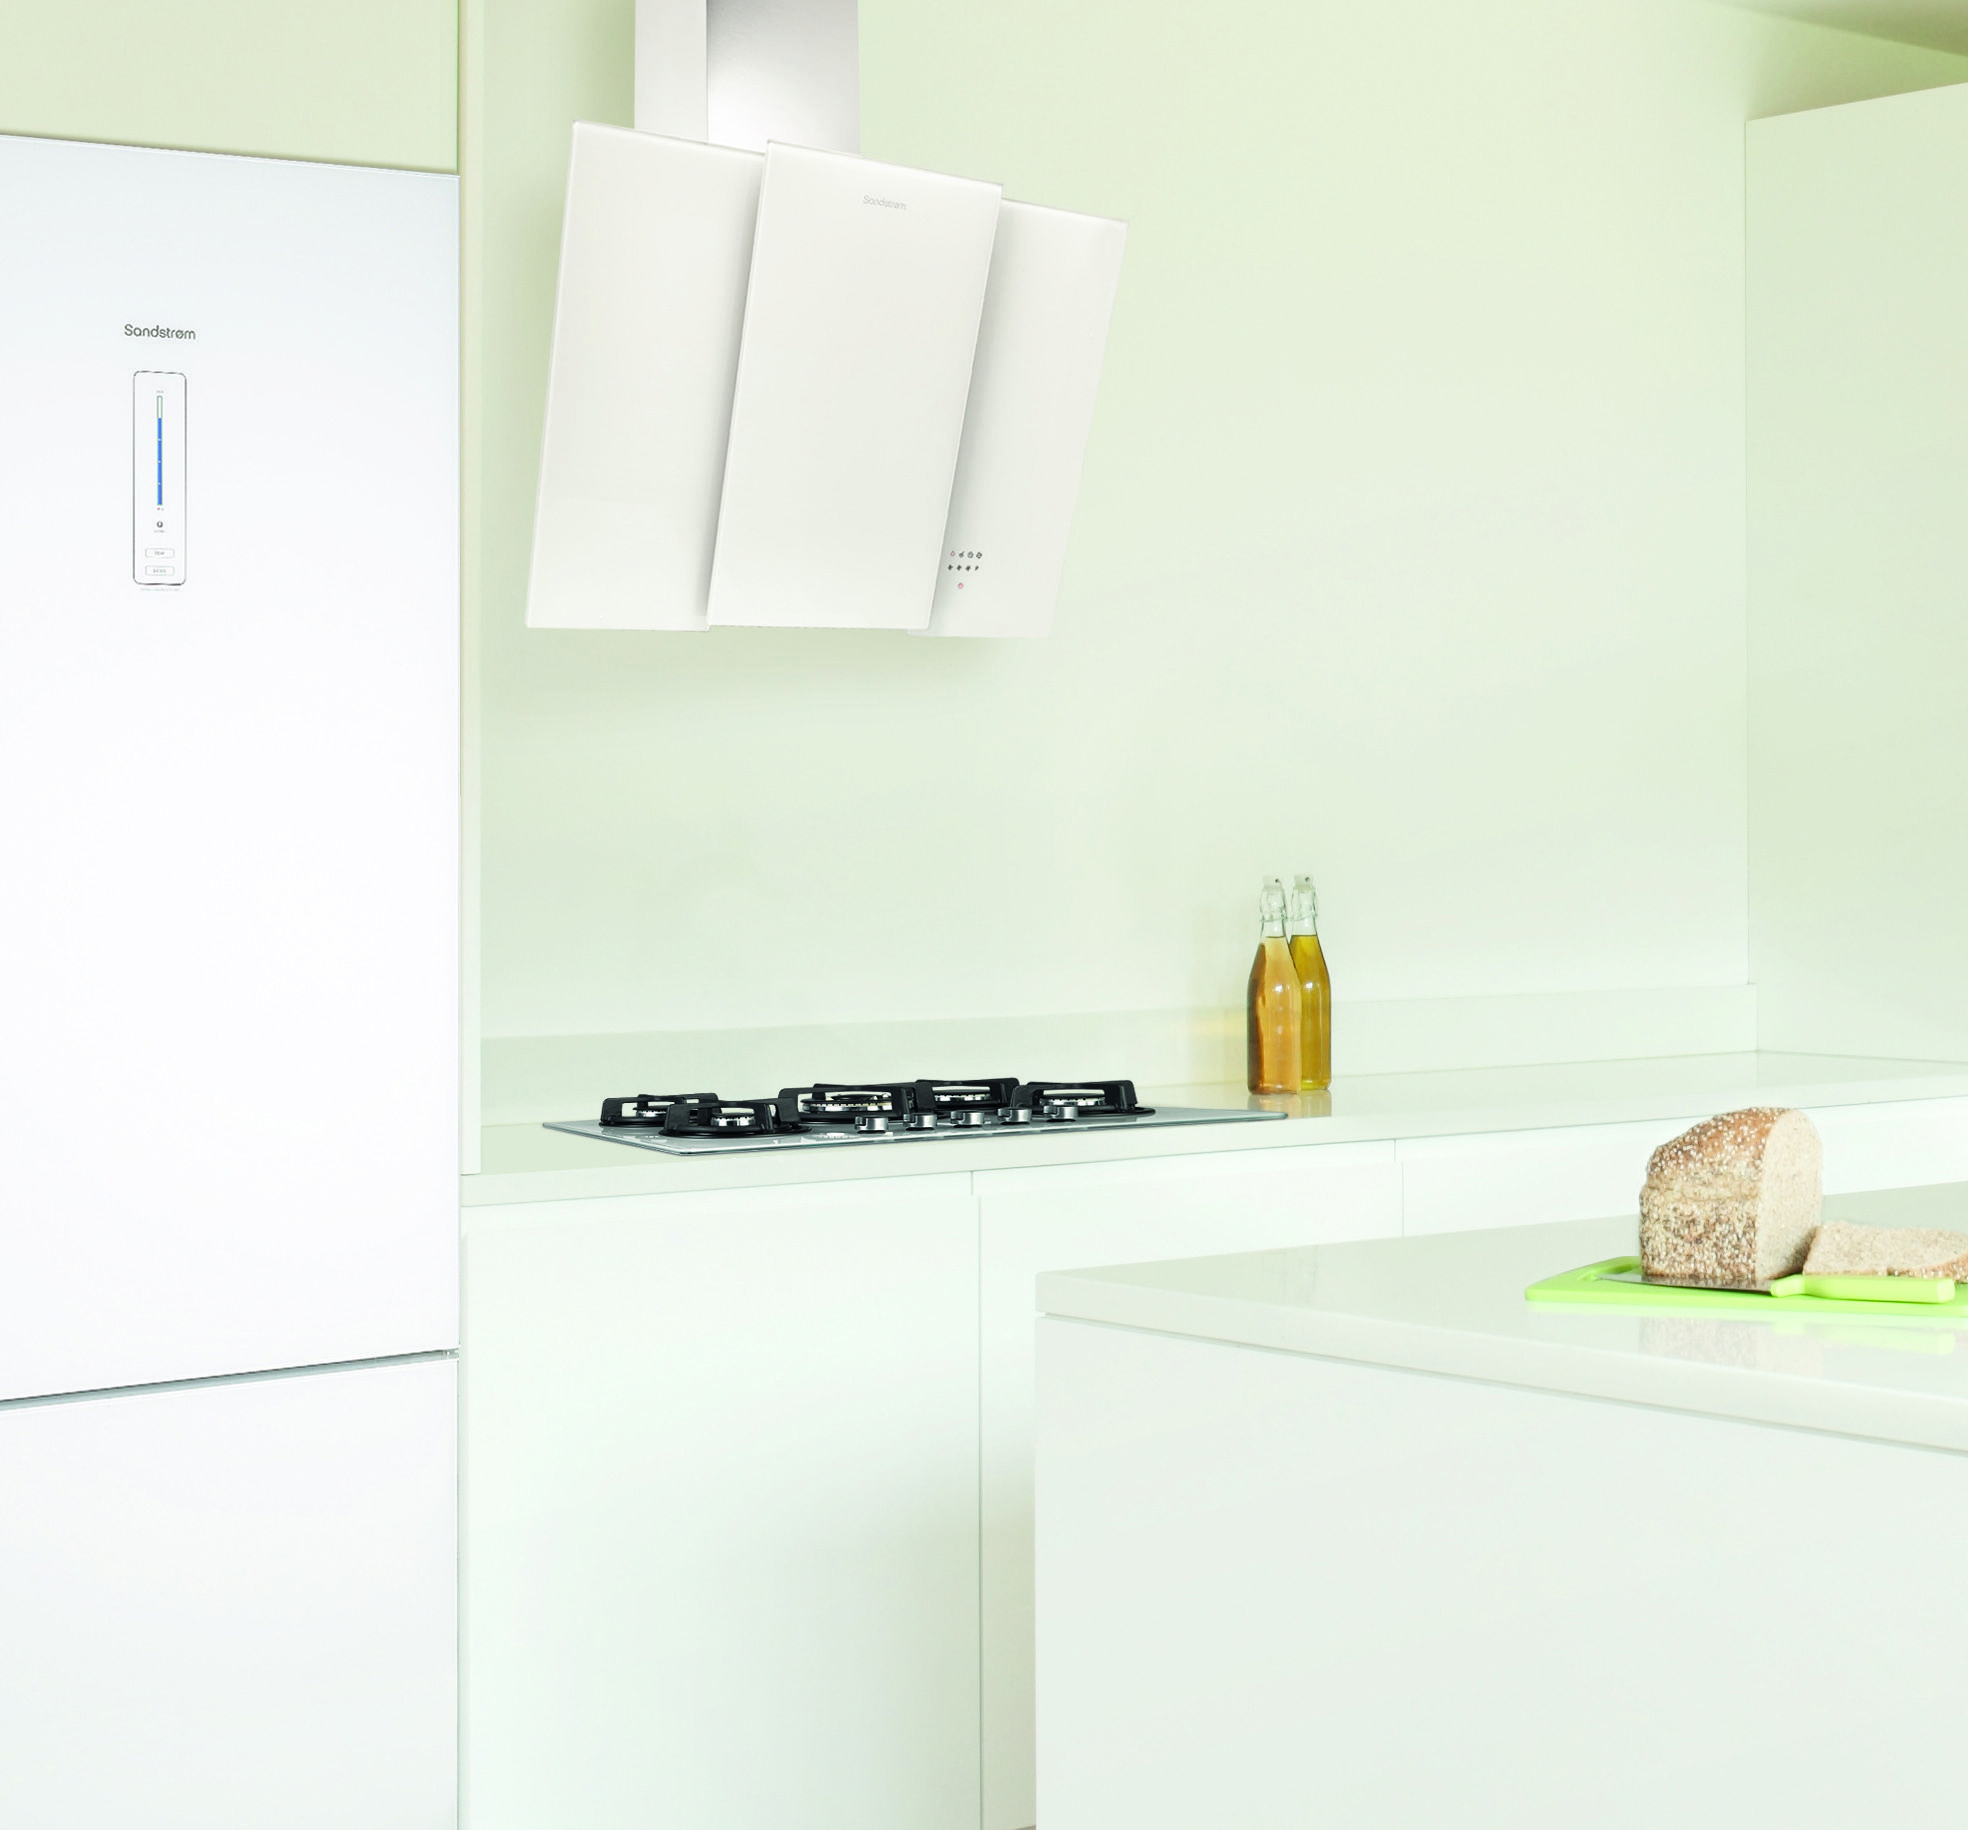 Orinda Oaks: Sandstrøm S80GHW13 White Cooker Hood Available @Curry